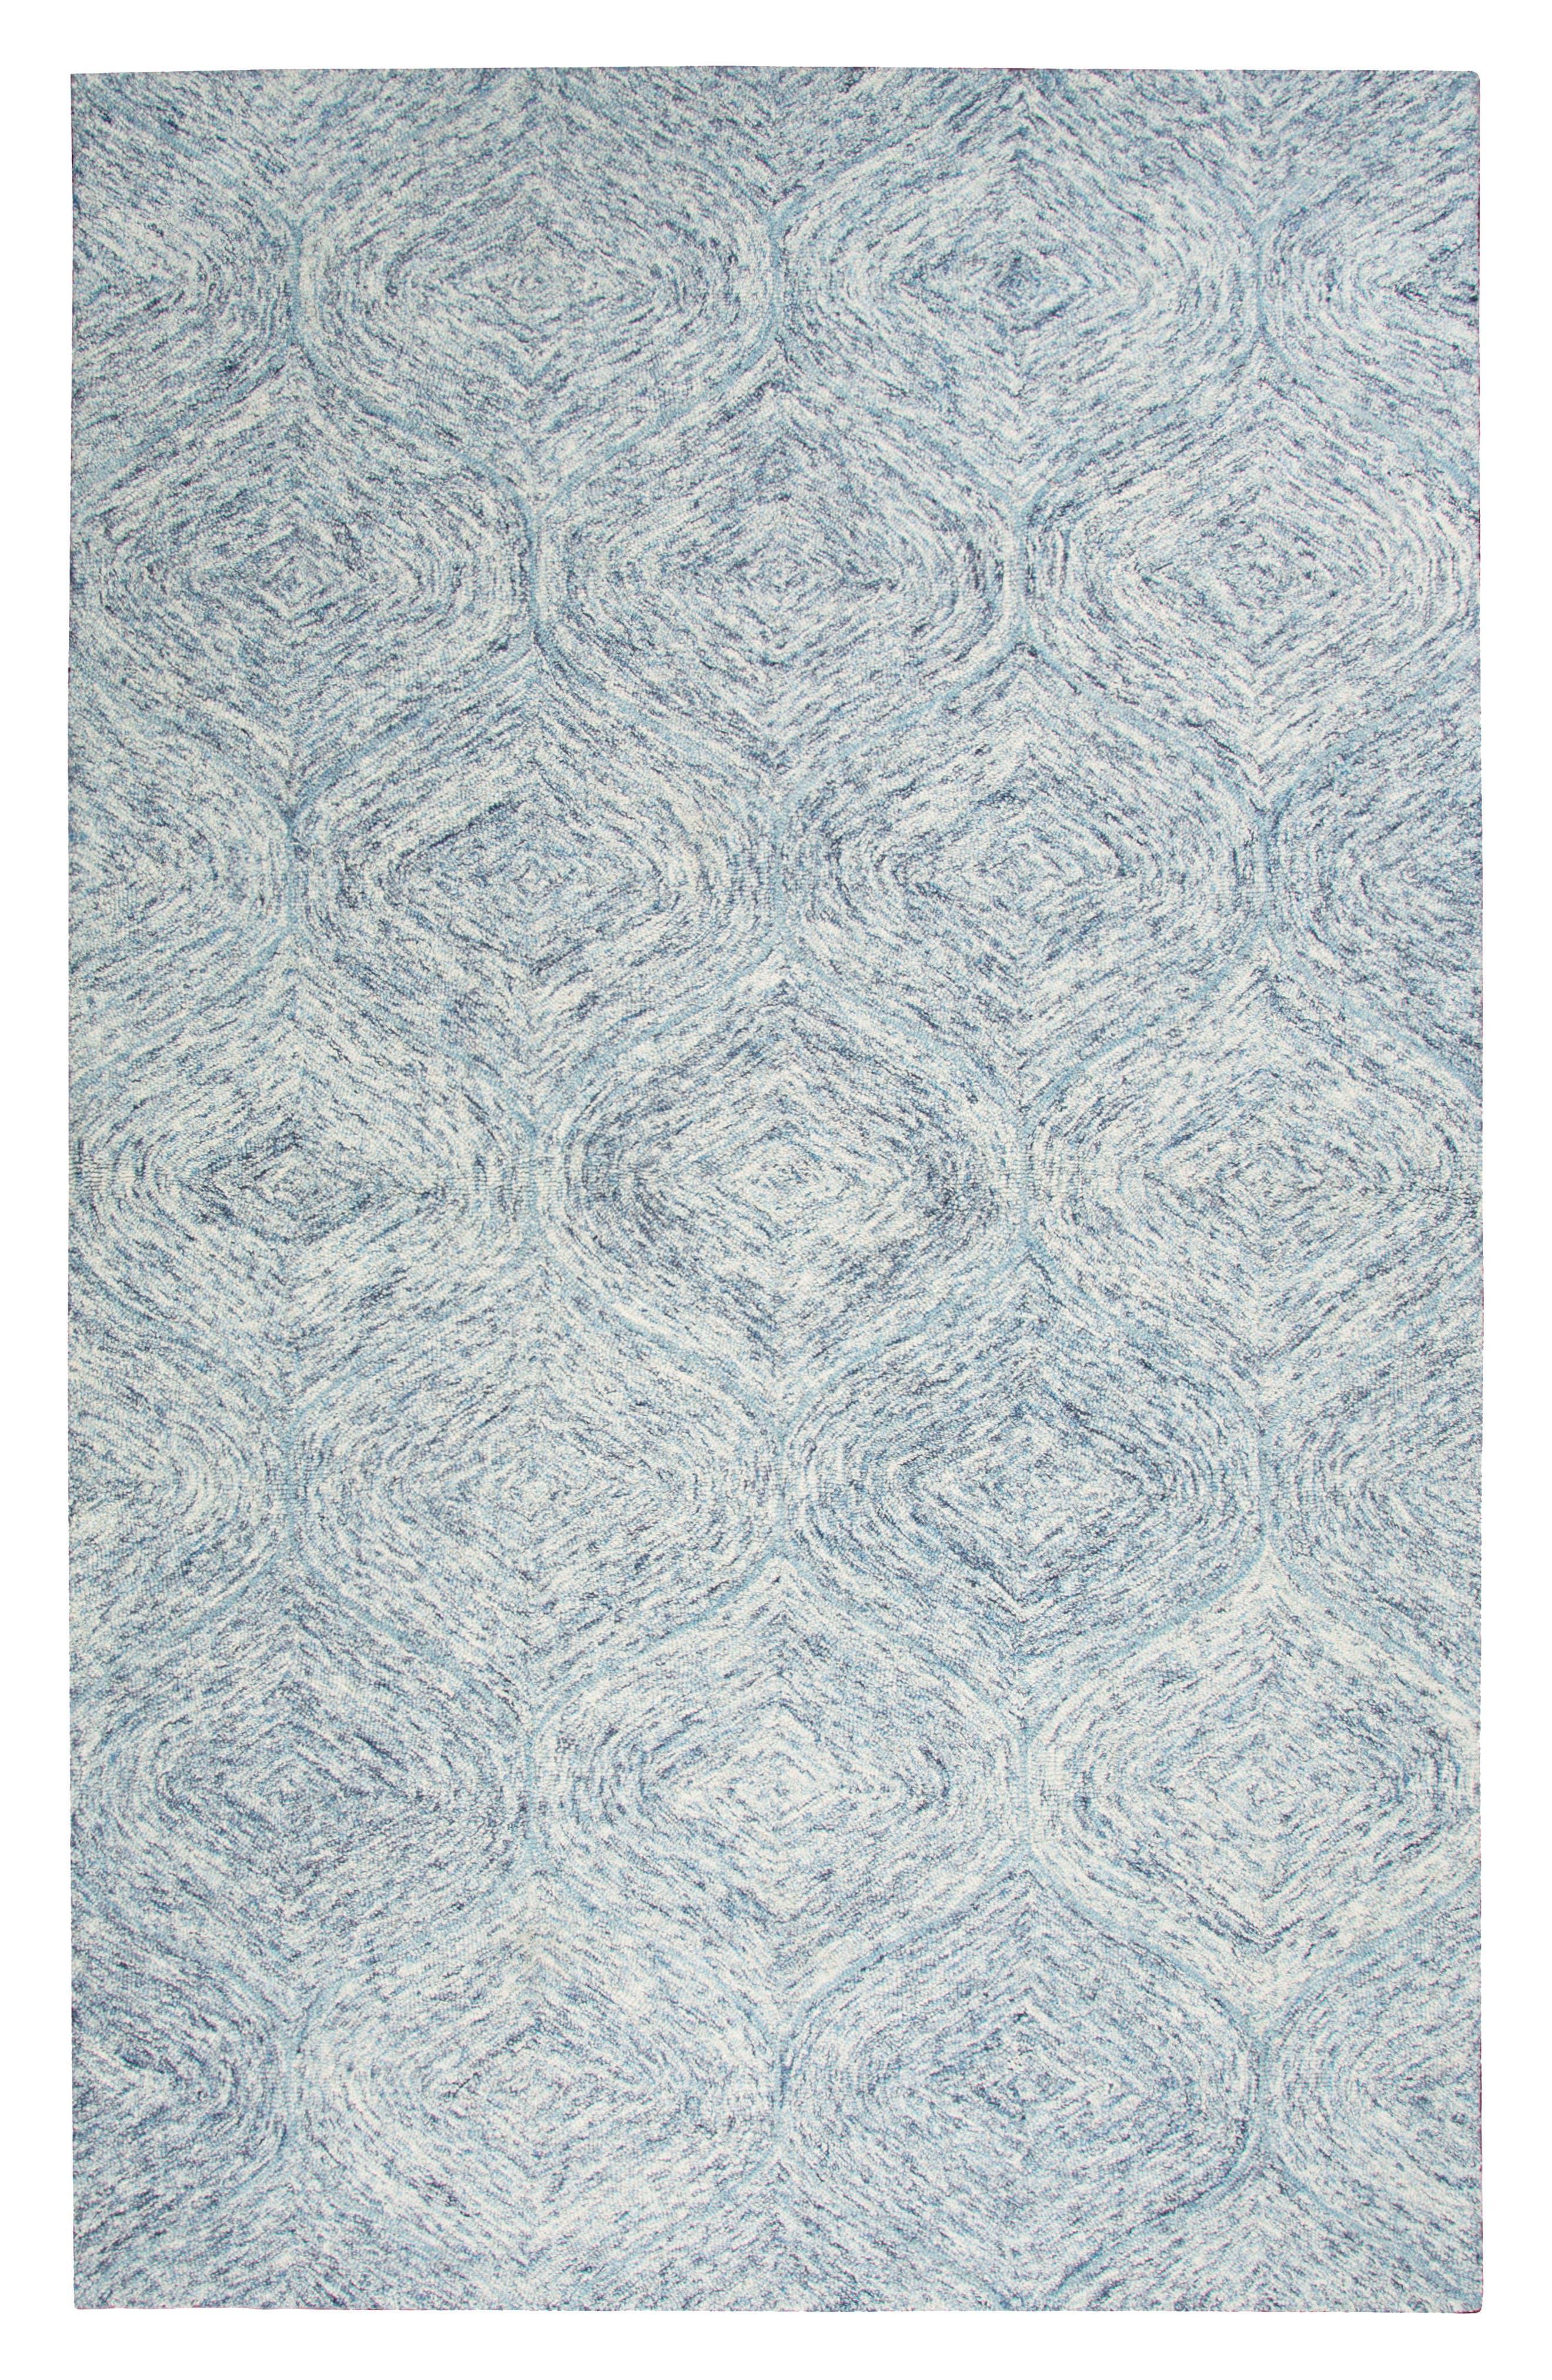 Irregular Diamond Hand Tufted Wool Area Rug,                             Main thumbnail 5, color,